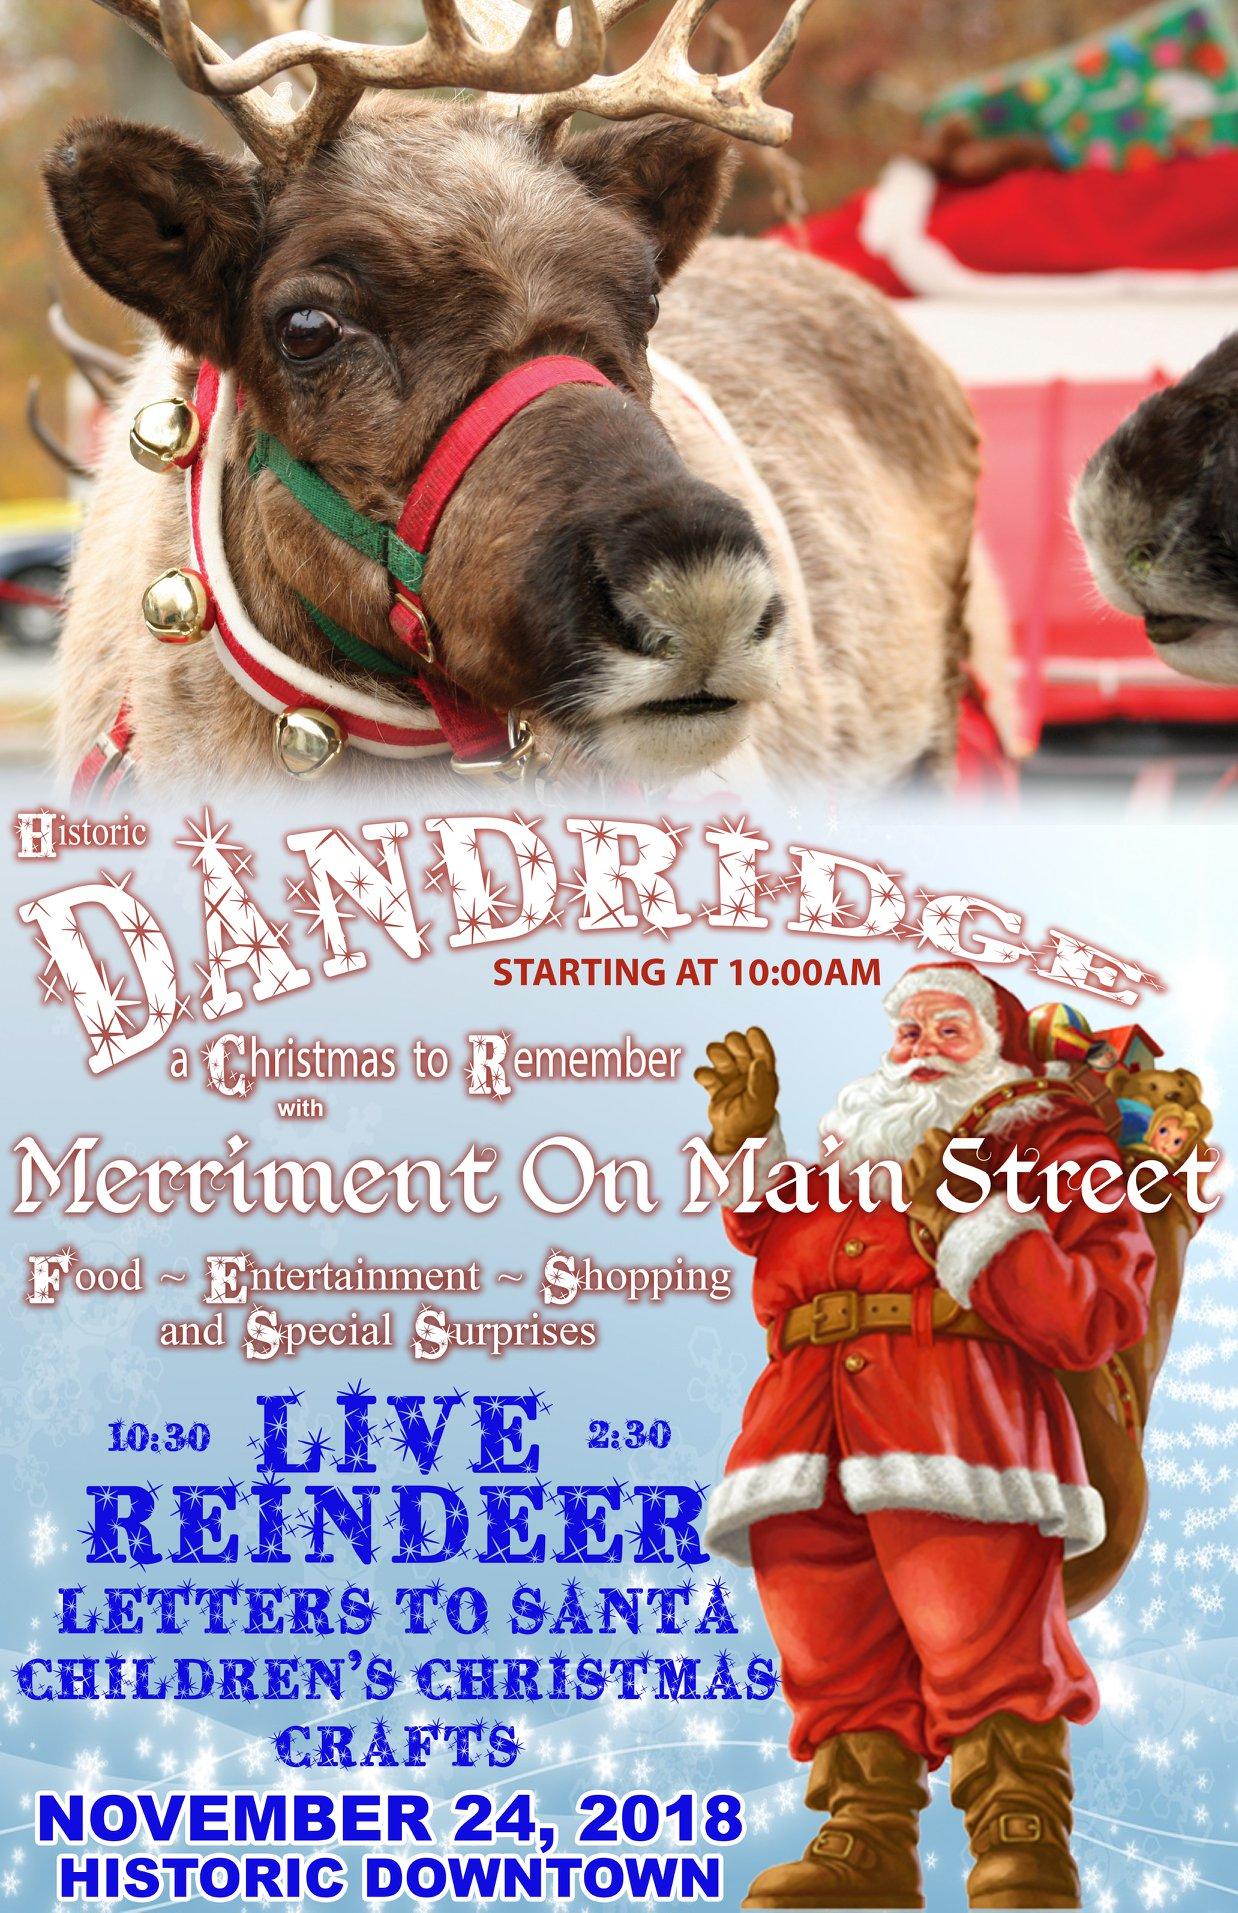 Merriment on Main Street, Dandridge, TN